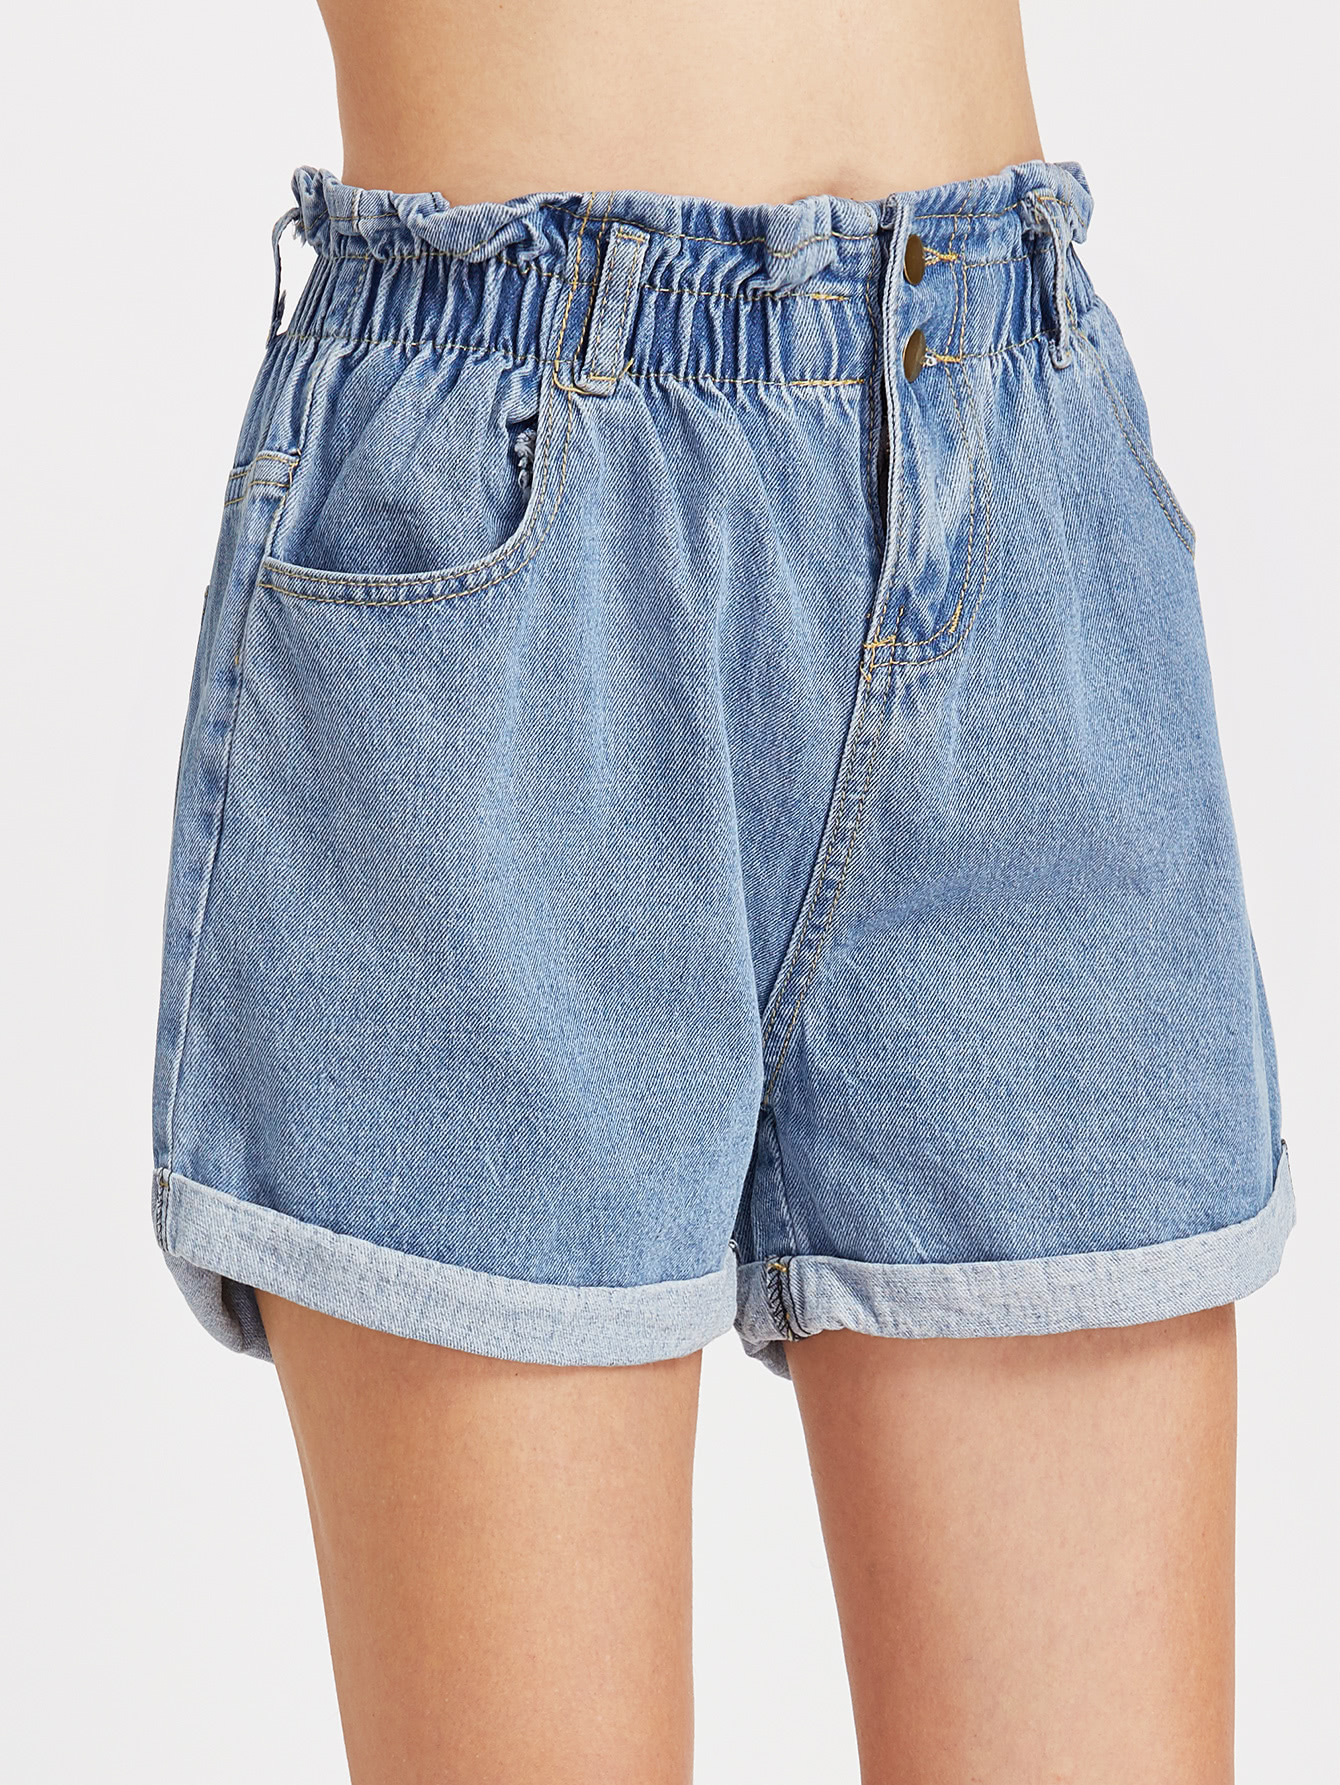 dec3296e43 KOZ1.com   Shop for latest women's fashion dresses, tops, bottoms.